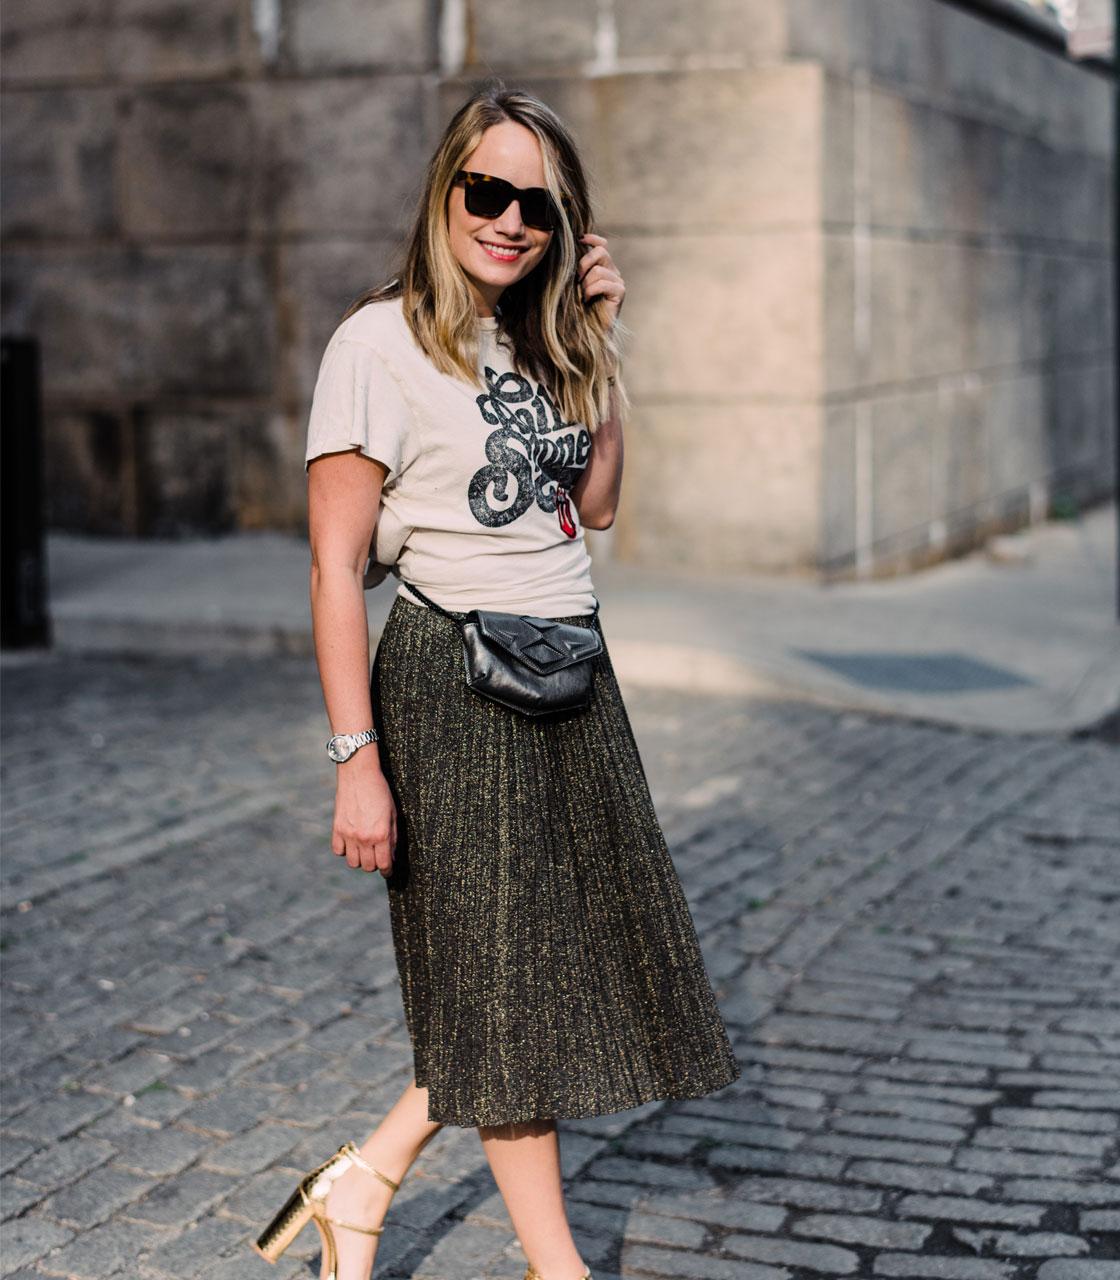 9474d31b8b Vintage Tee + Metallic Skirt. - The Stripe